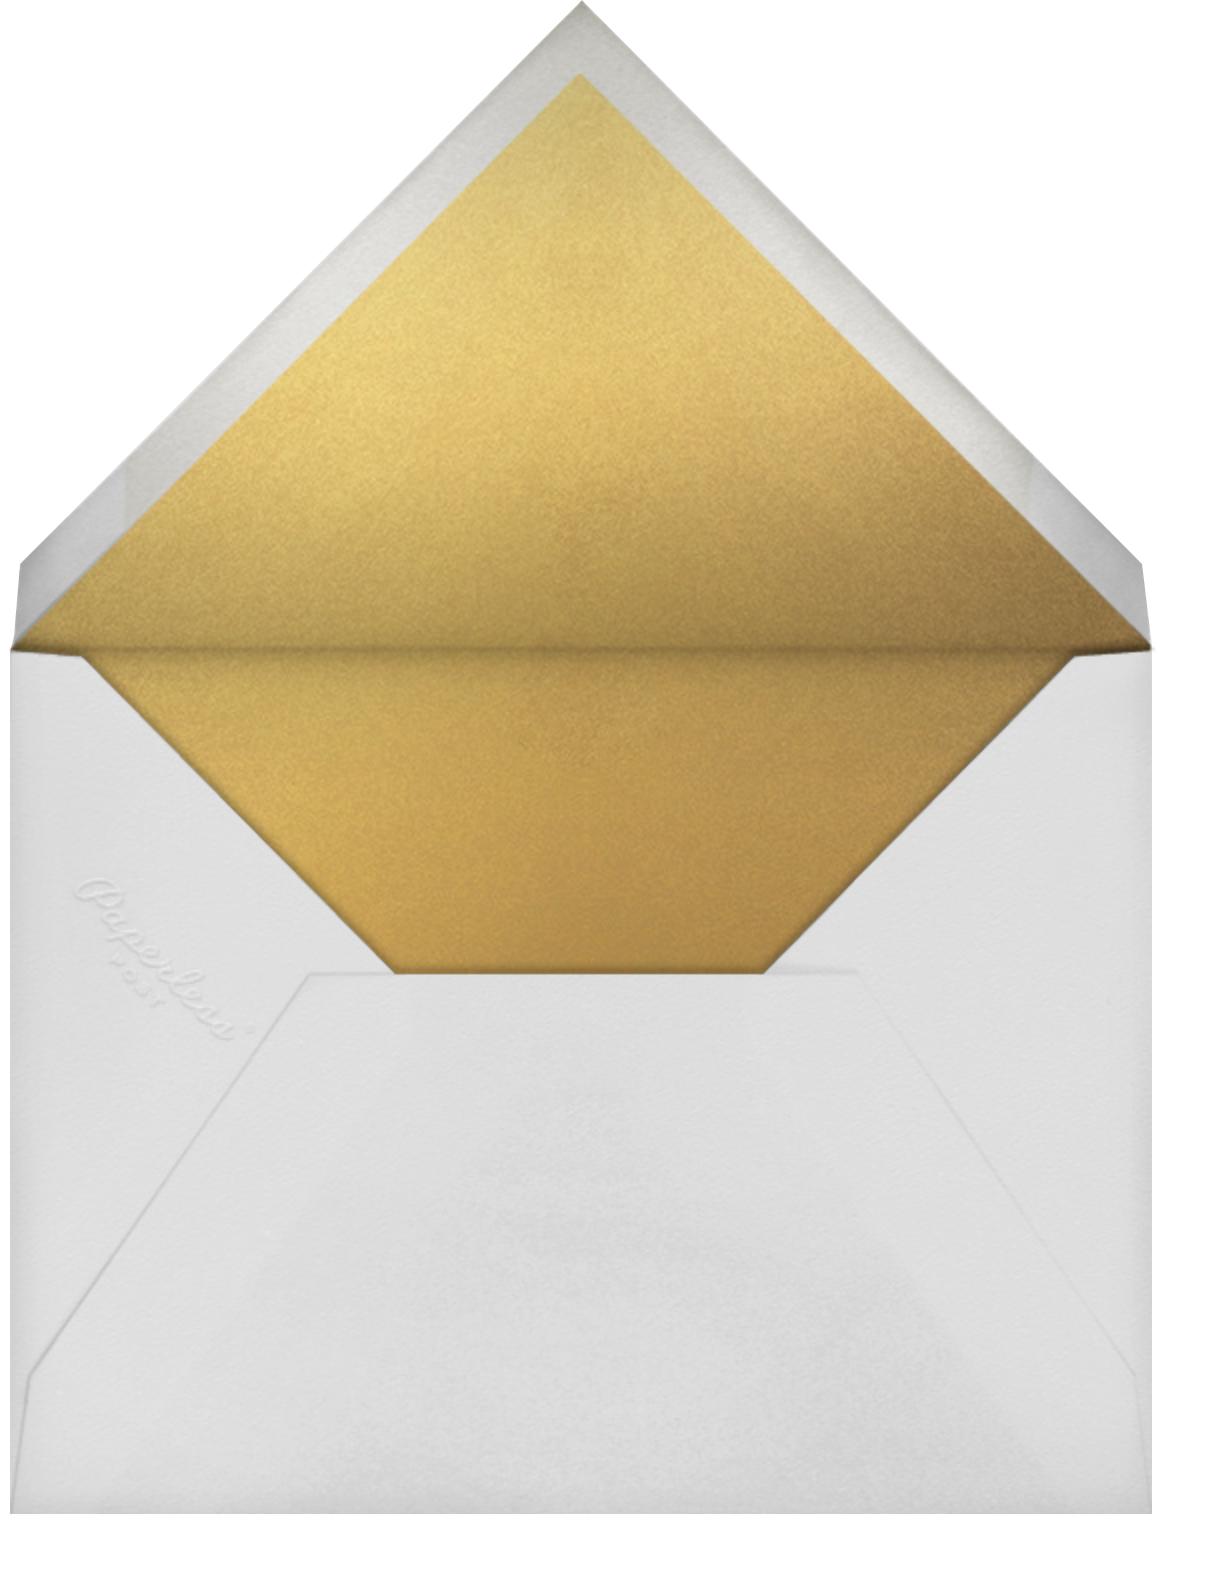 Shining Gold - Virtual - Paperless Post - Corporate invitations - envelope back